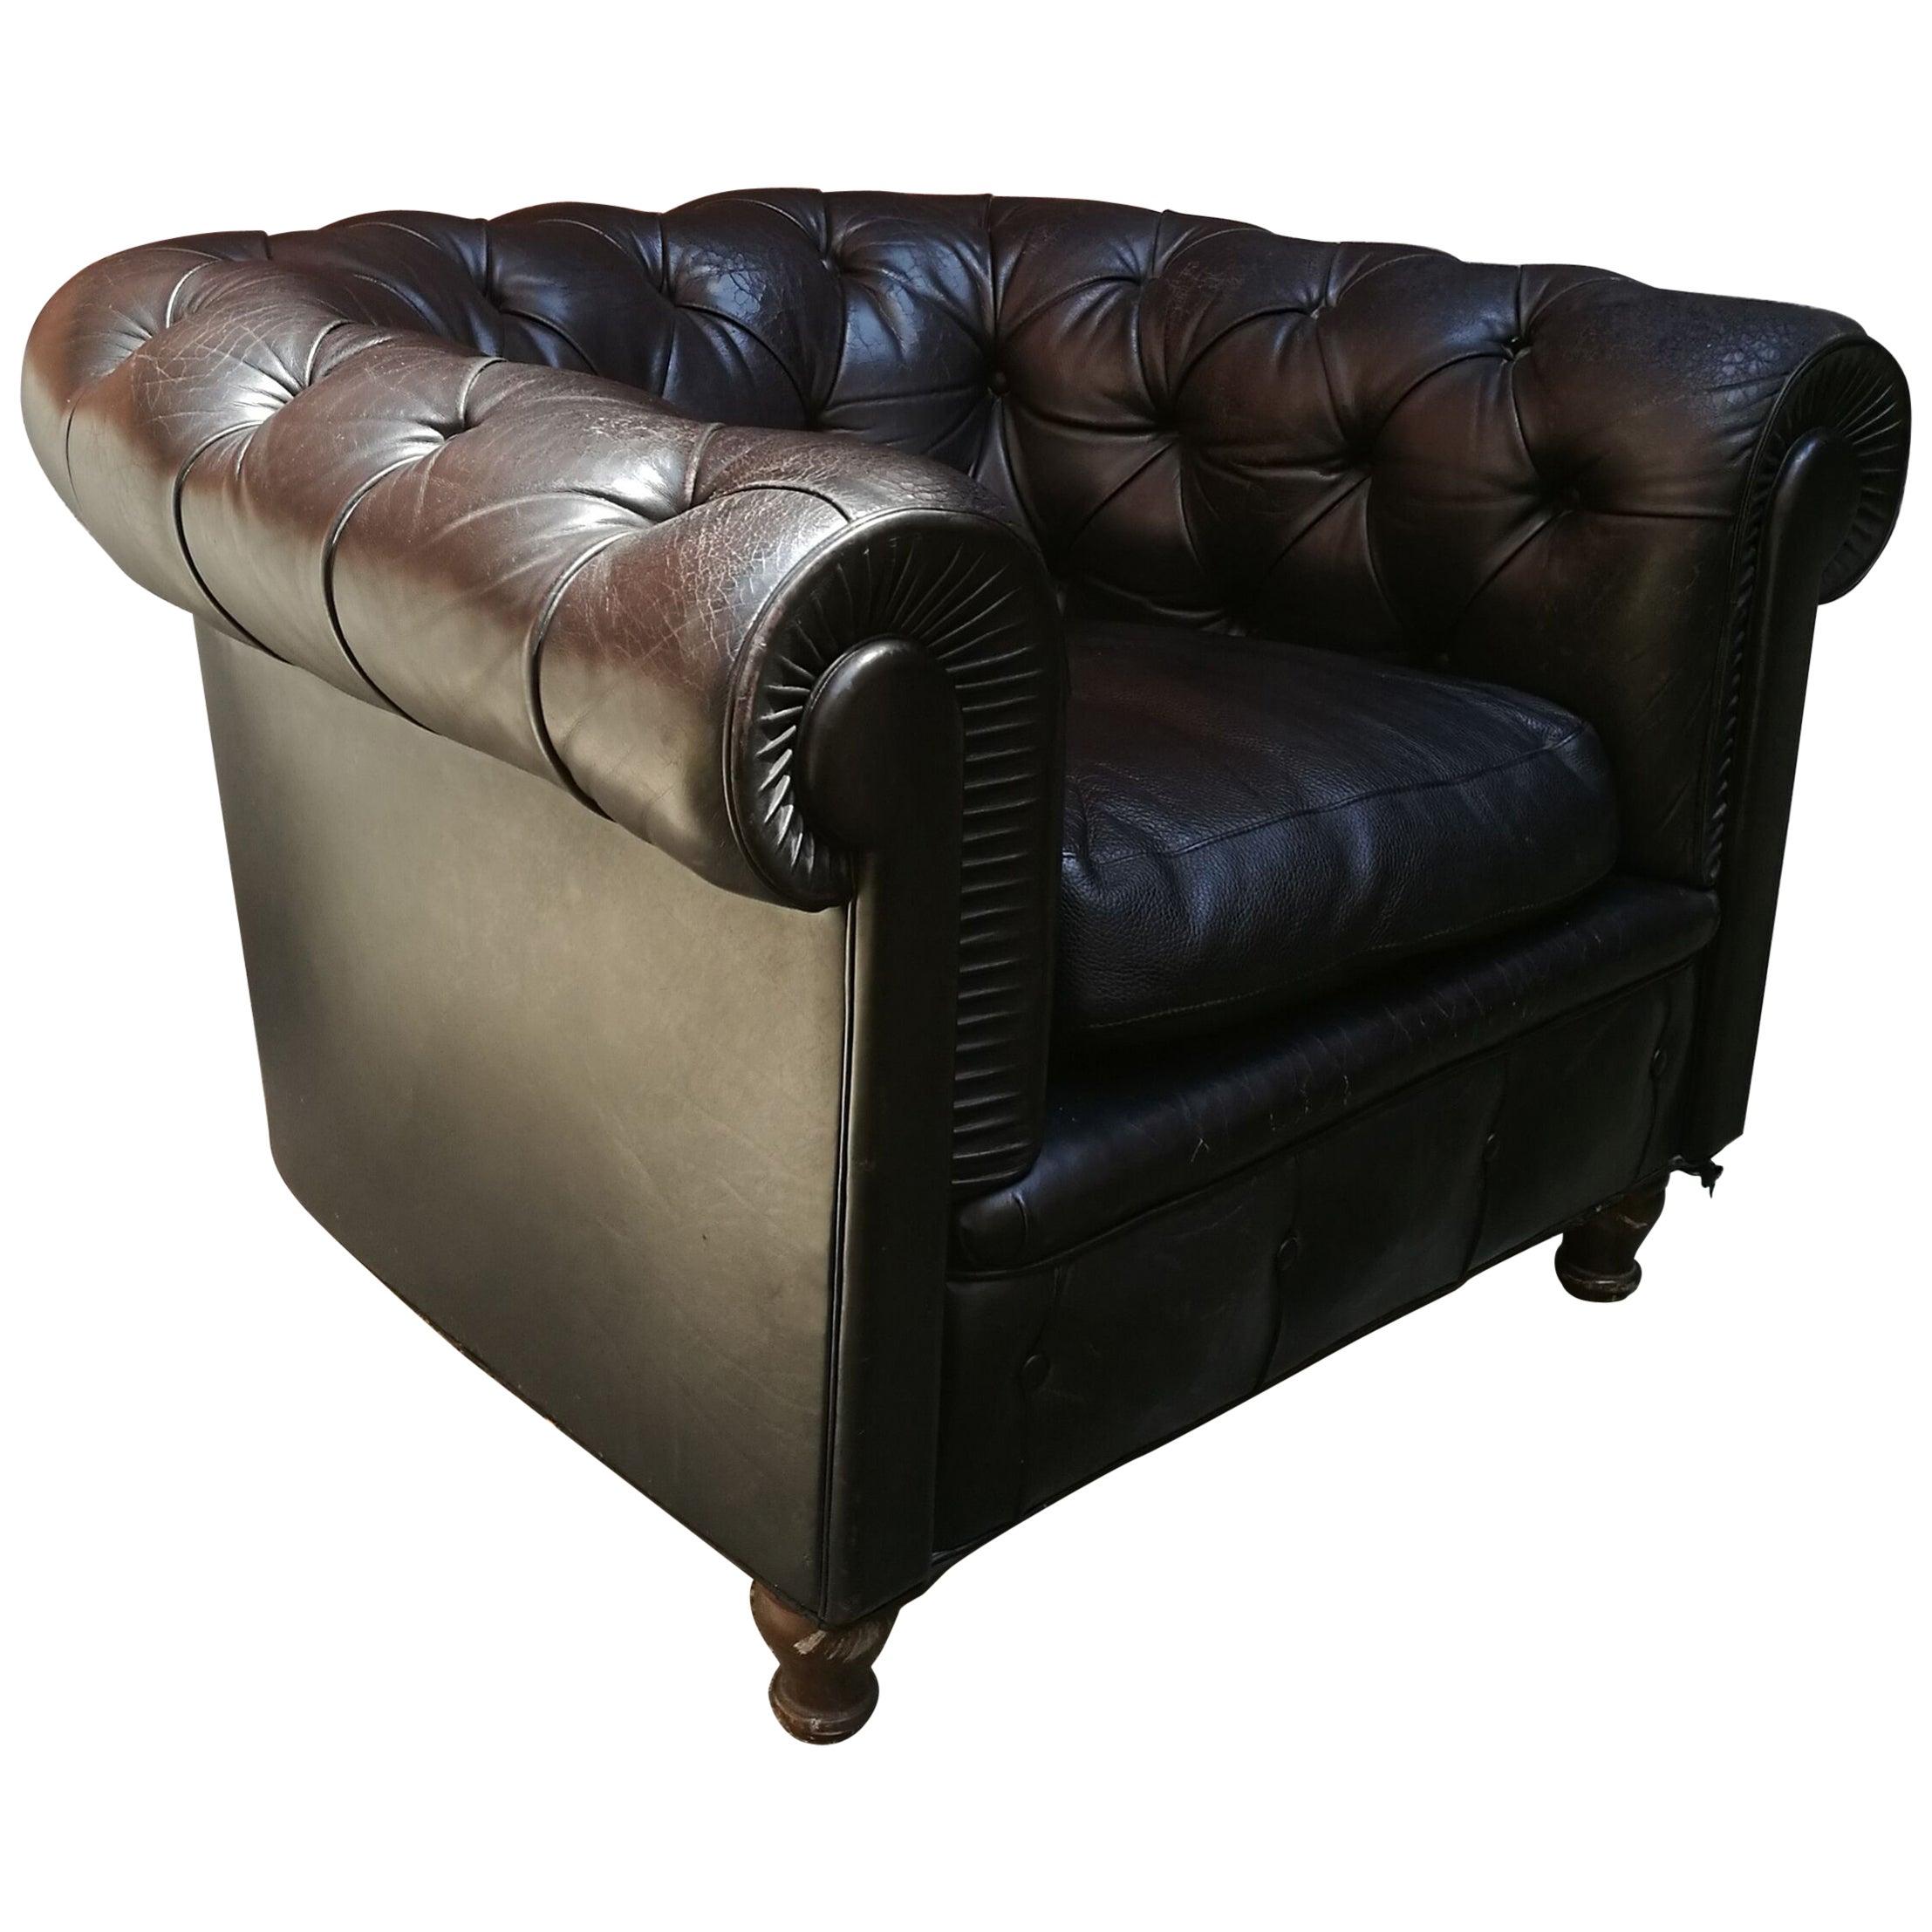 Black Lather Italian Chester Poltrona Frau Original Armchairs from 1960s